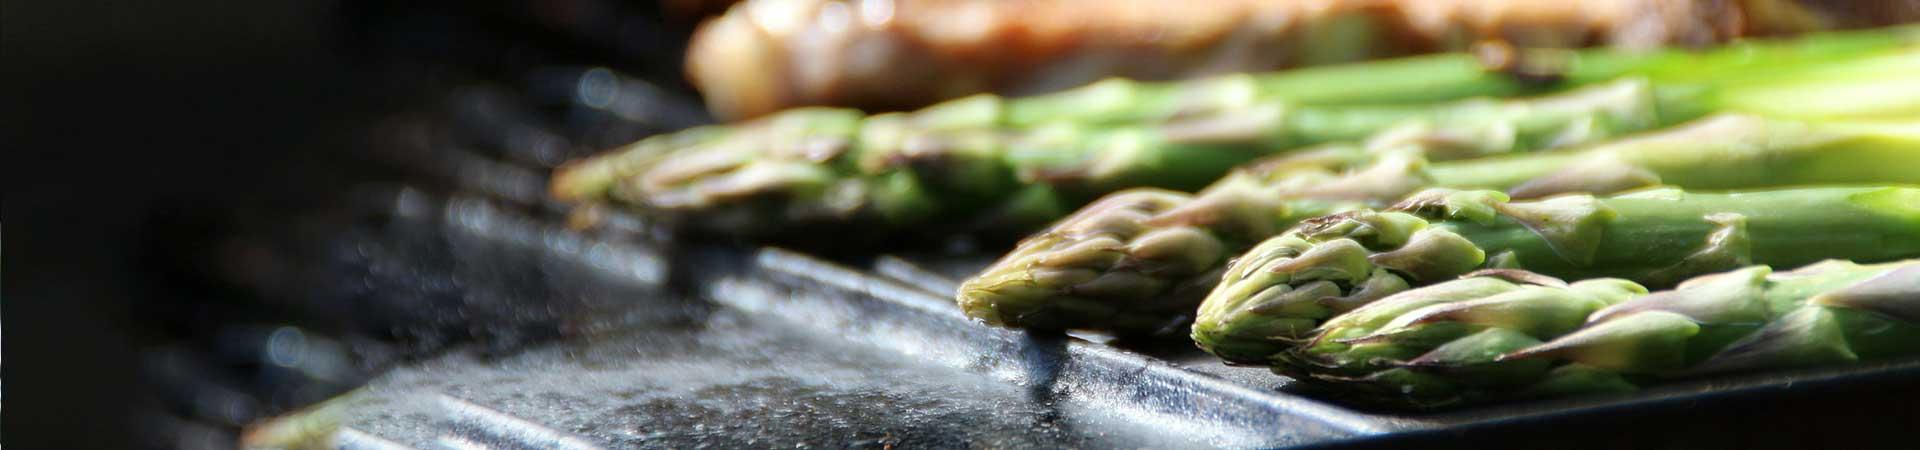 kamado express grill vegetables